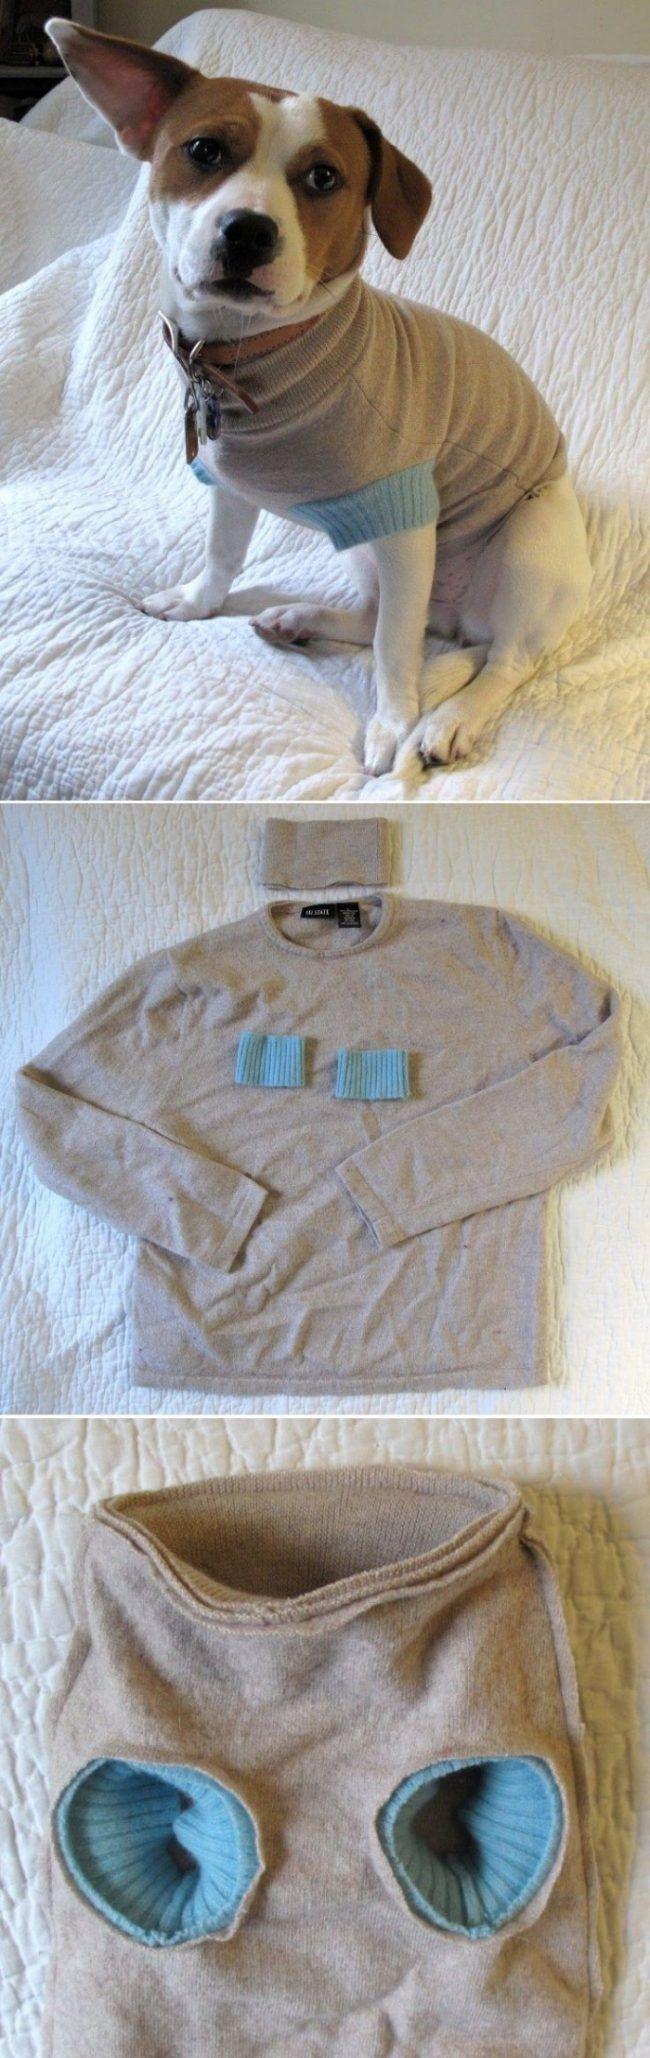 pretty nice 2c1b1 b39eb Hundebekleidung-selber-machen-Hundepullover-alte-Kleidung ...